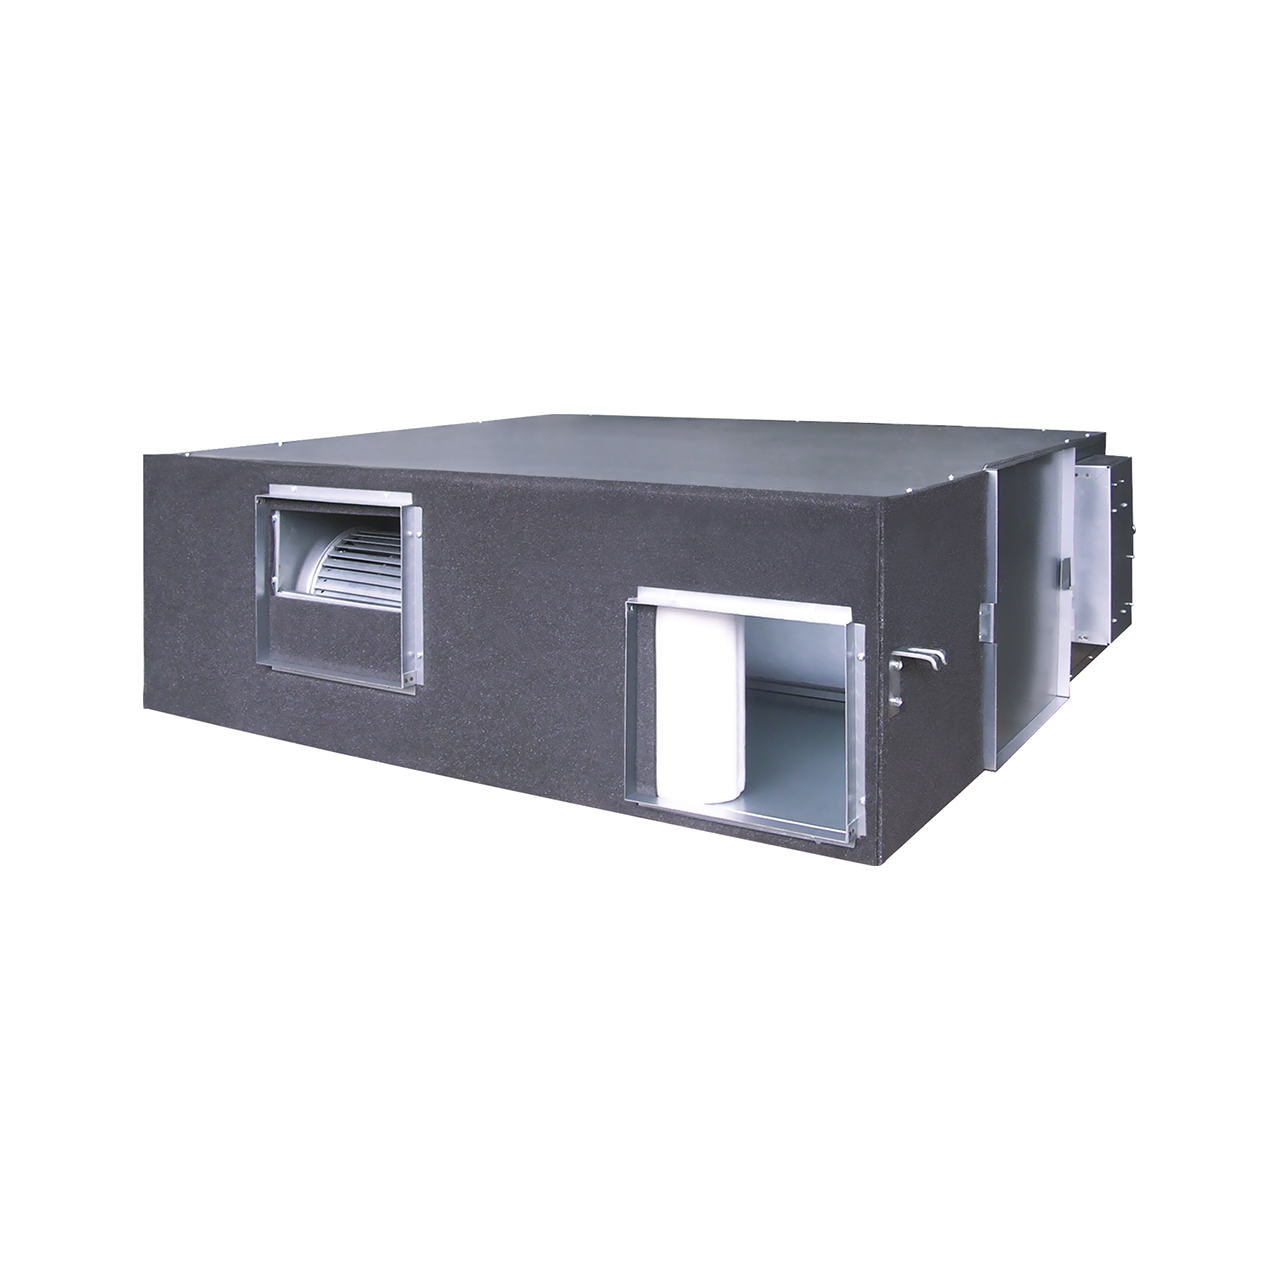 xct7-indoor-units-HRV